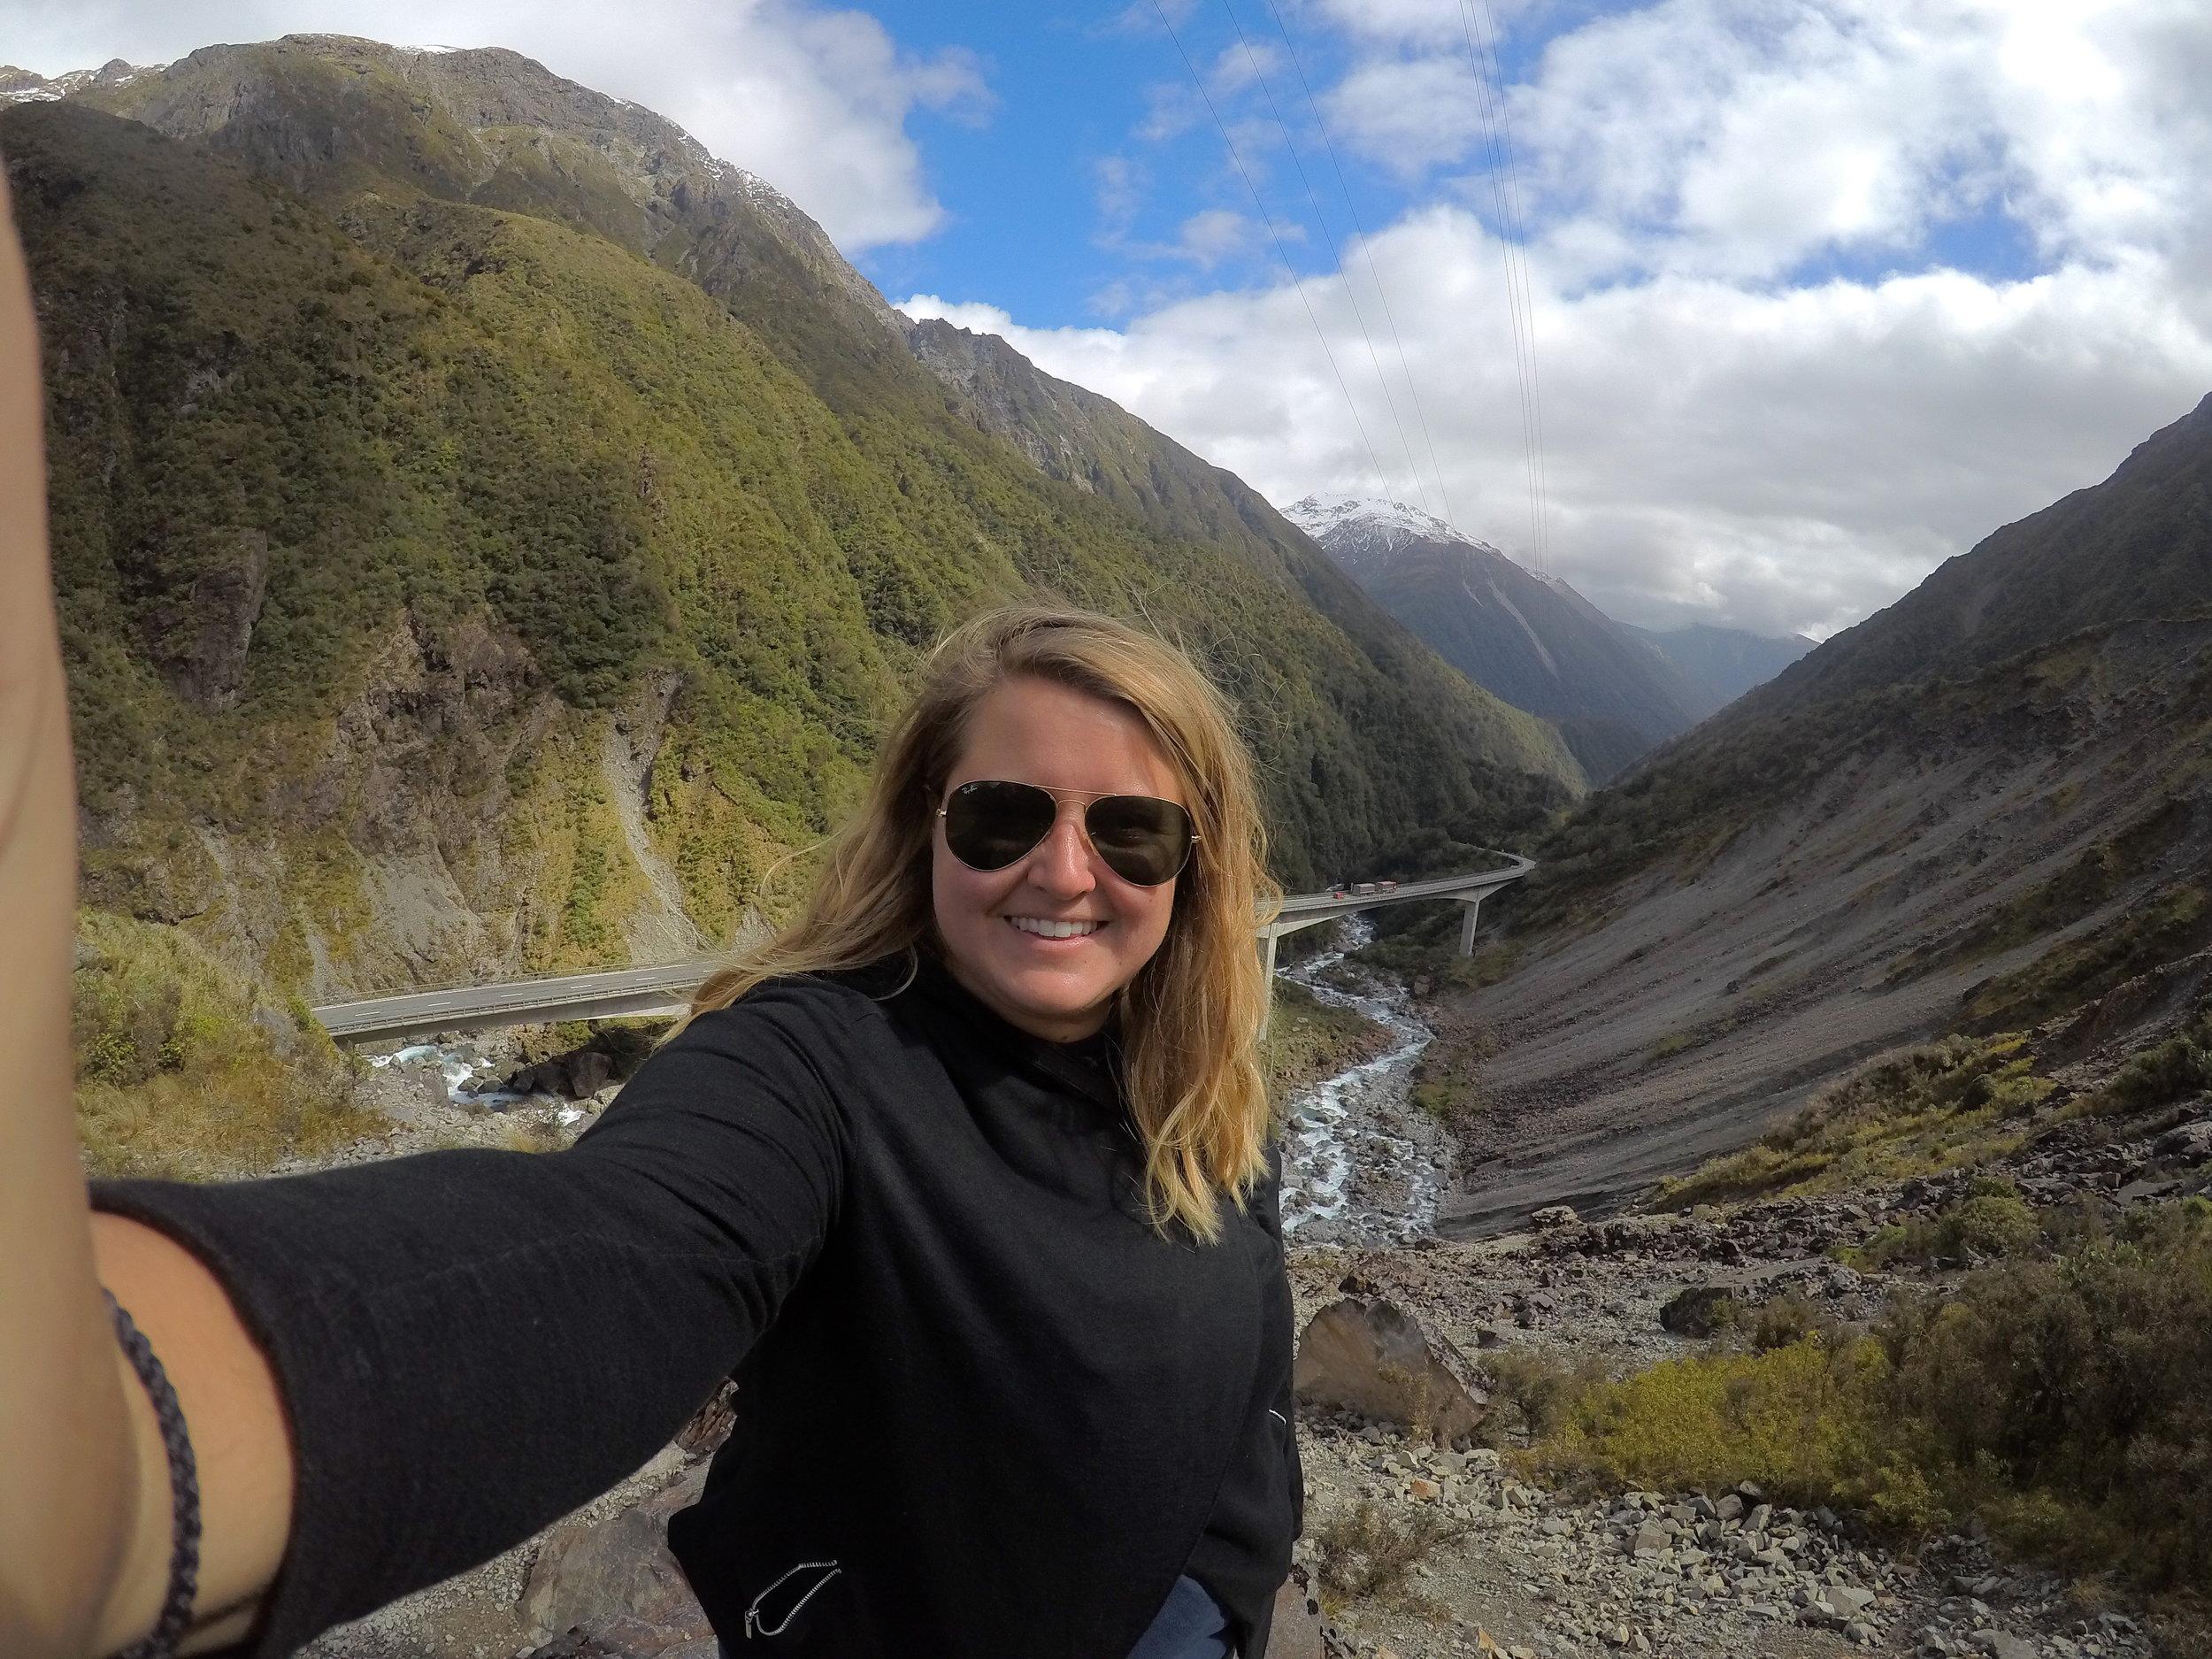 Exploring the South Island of New Zealand - Arthur's Pass